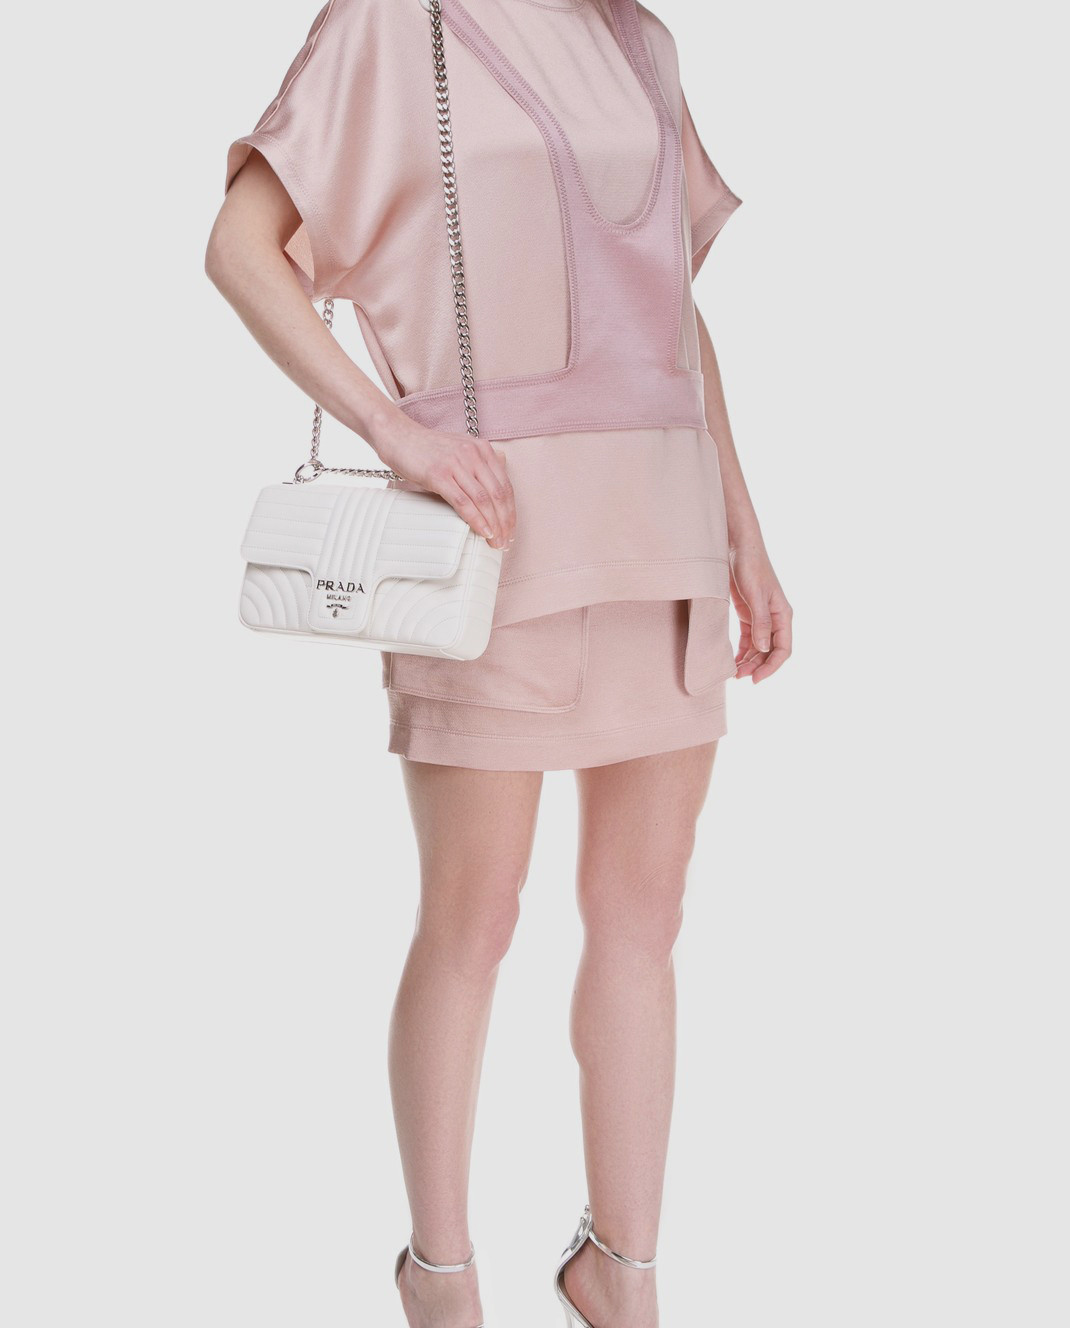 Valentino Розовая юбка PB0RA3K53H3 изображение 2